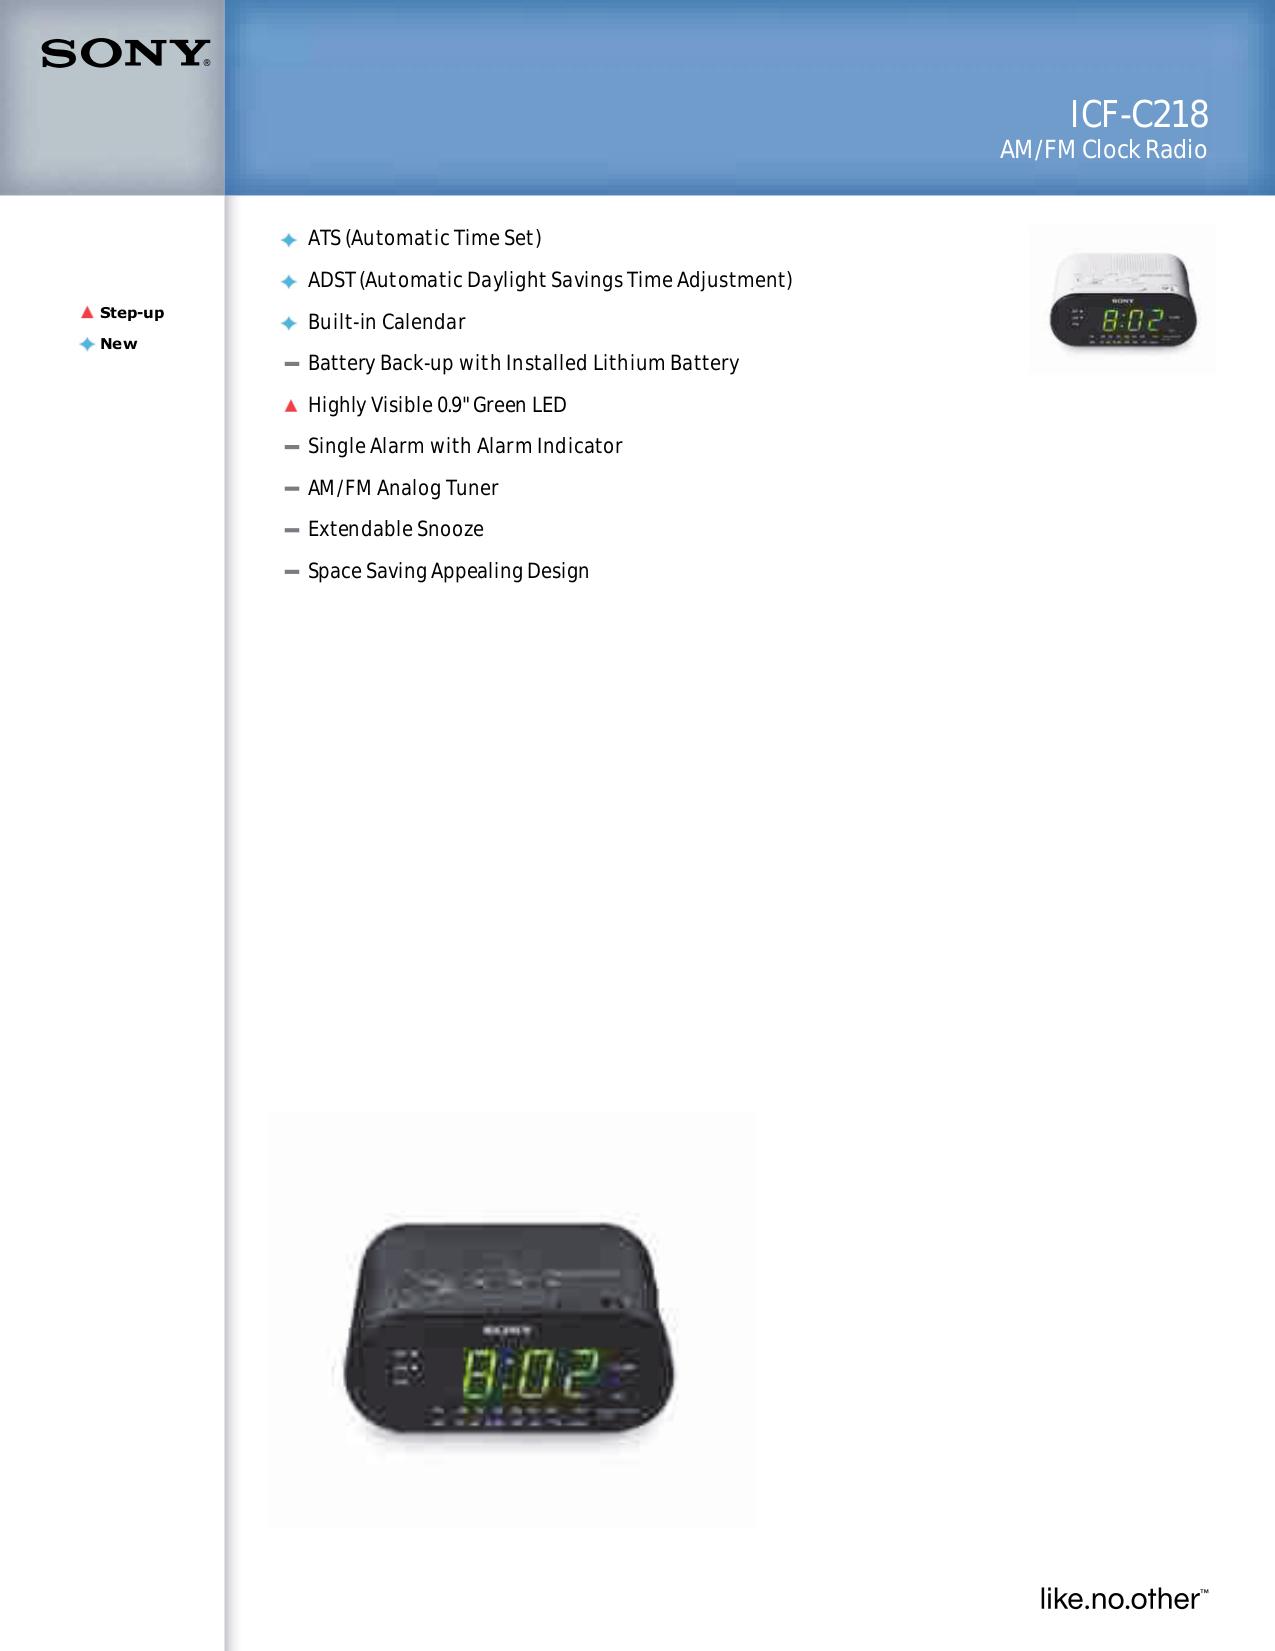 Download Free Pdf For Sony Icf C218 Clock Radio Manual